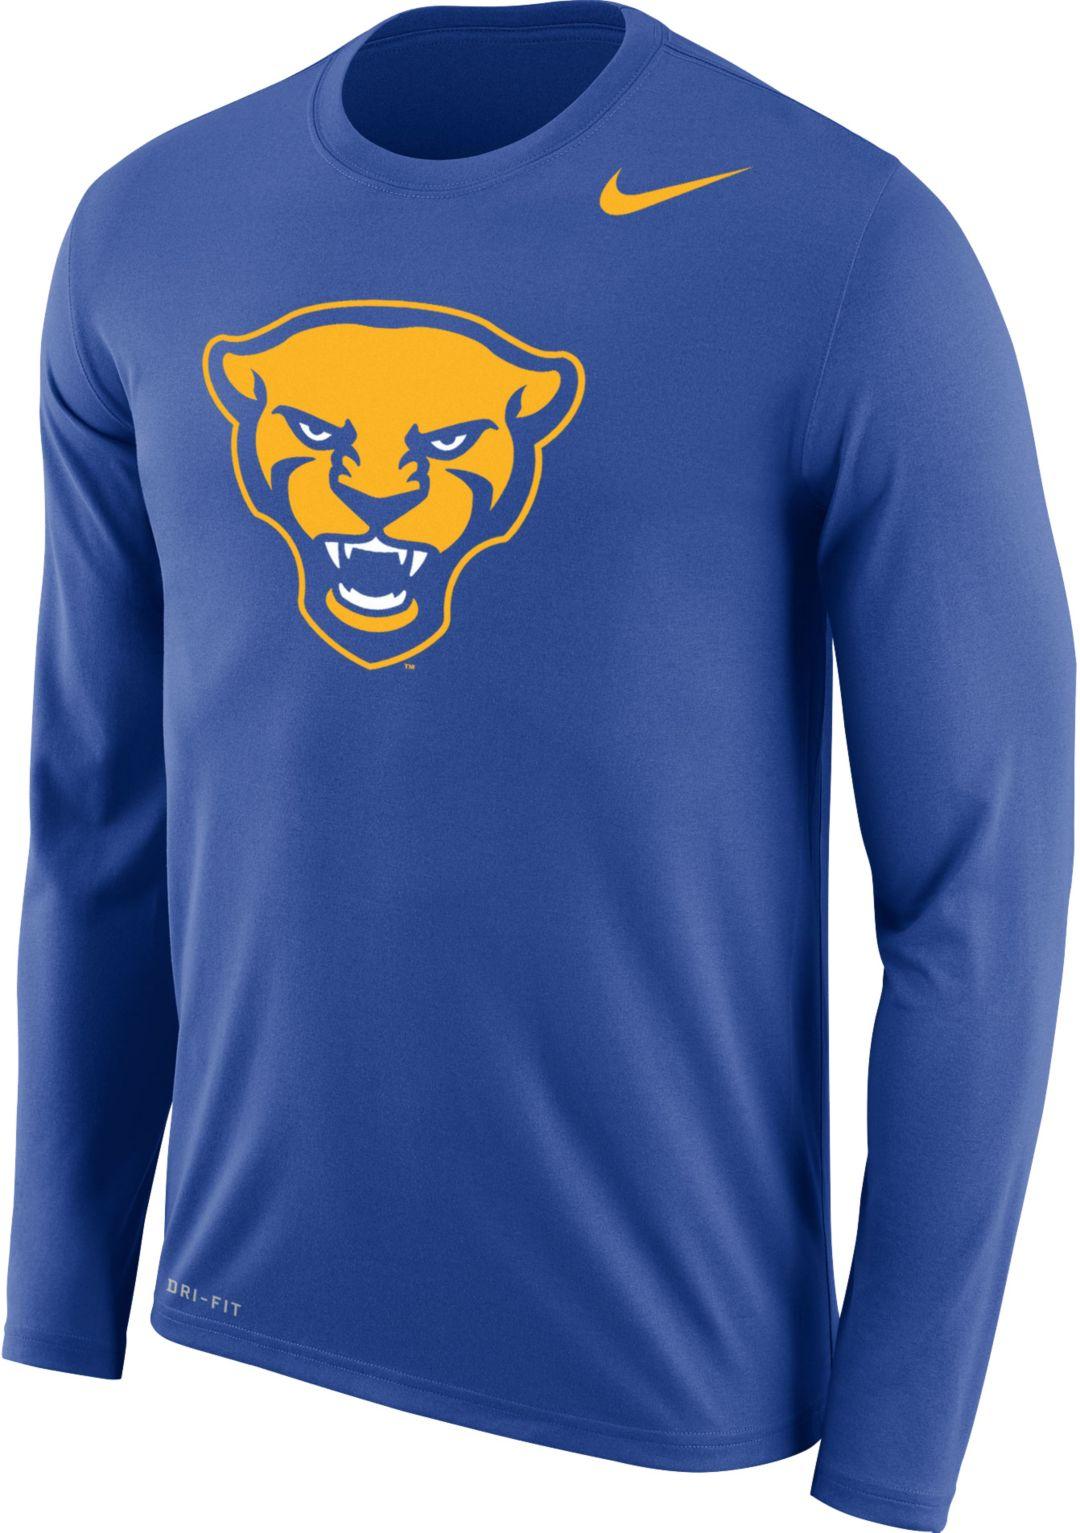 22be6a3c Nike Men's Pitt Panthers Blue Panther Head Logo Dri-FIT Long Sleeve T-Shirt.  noImageFound. 1